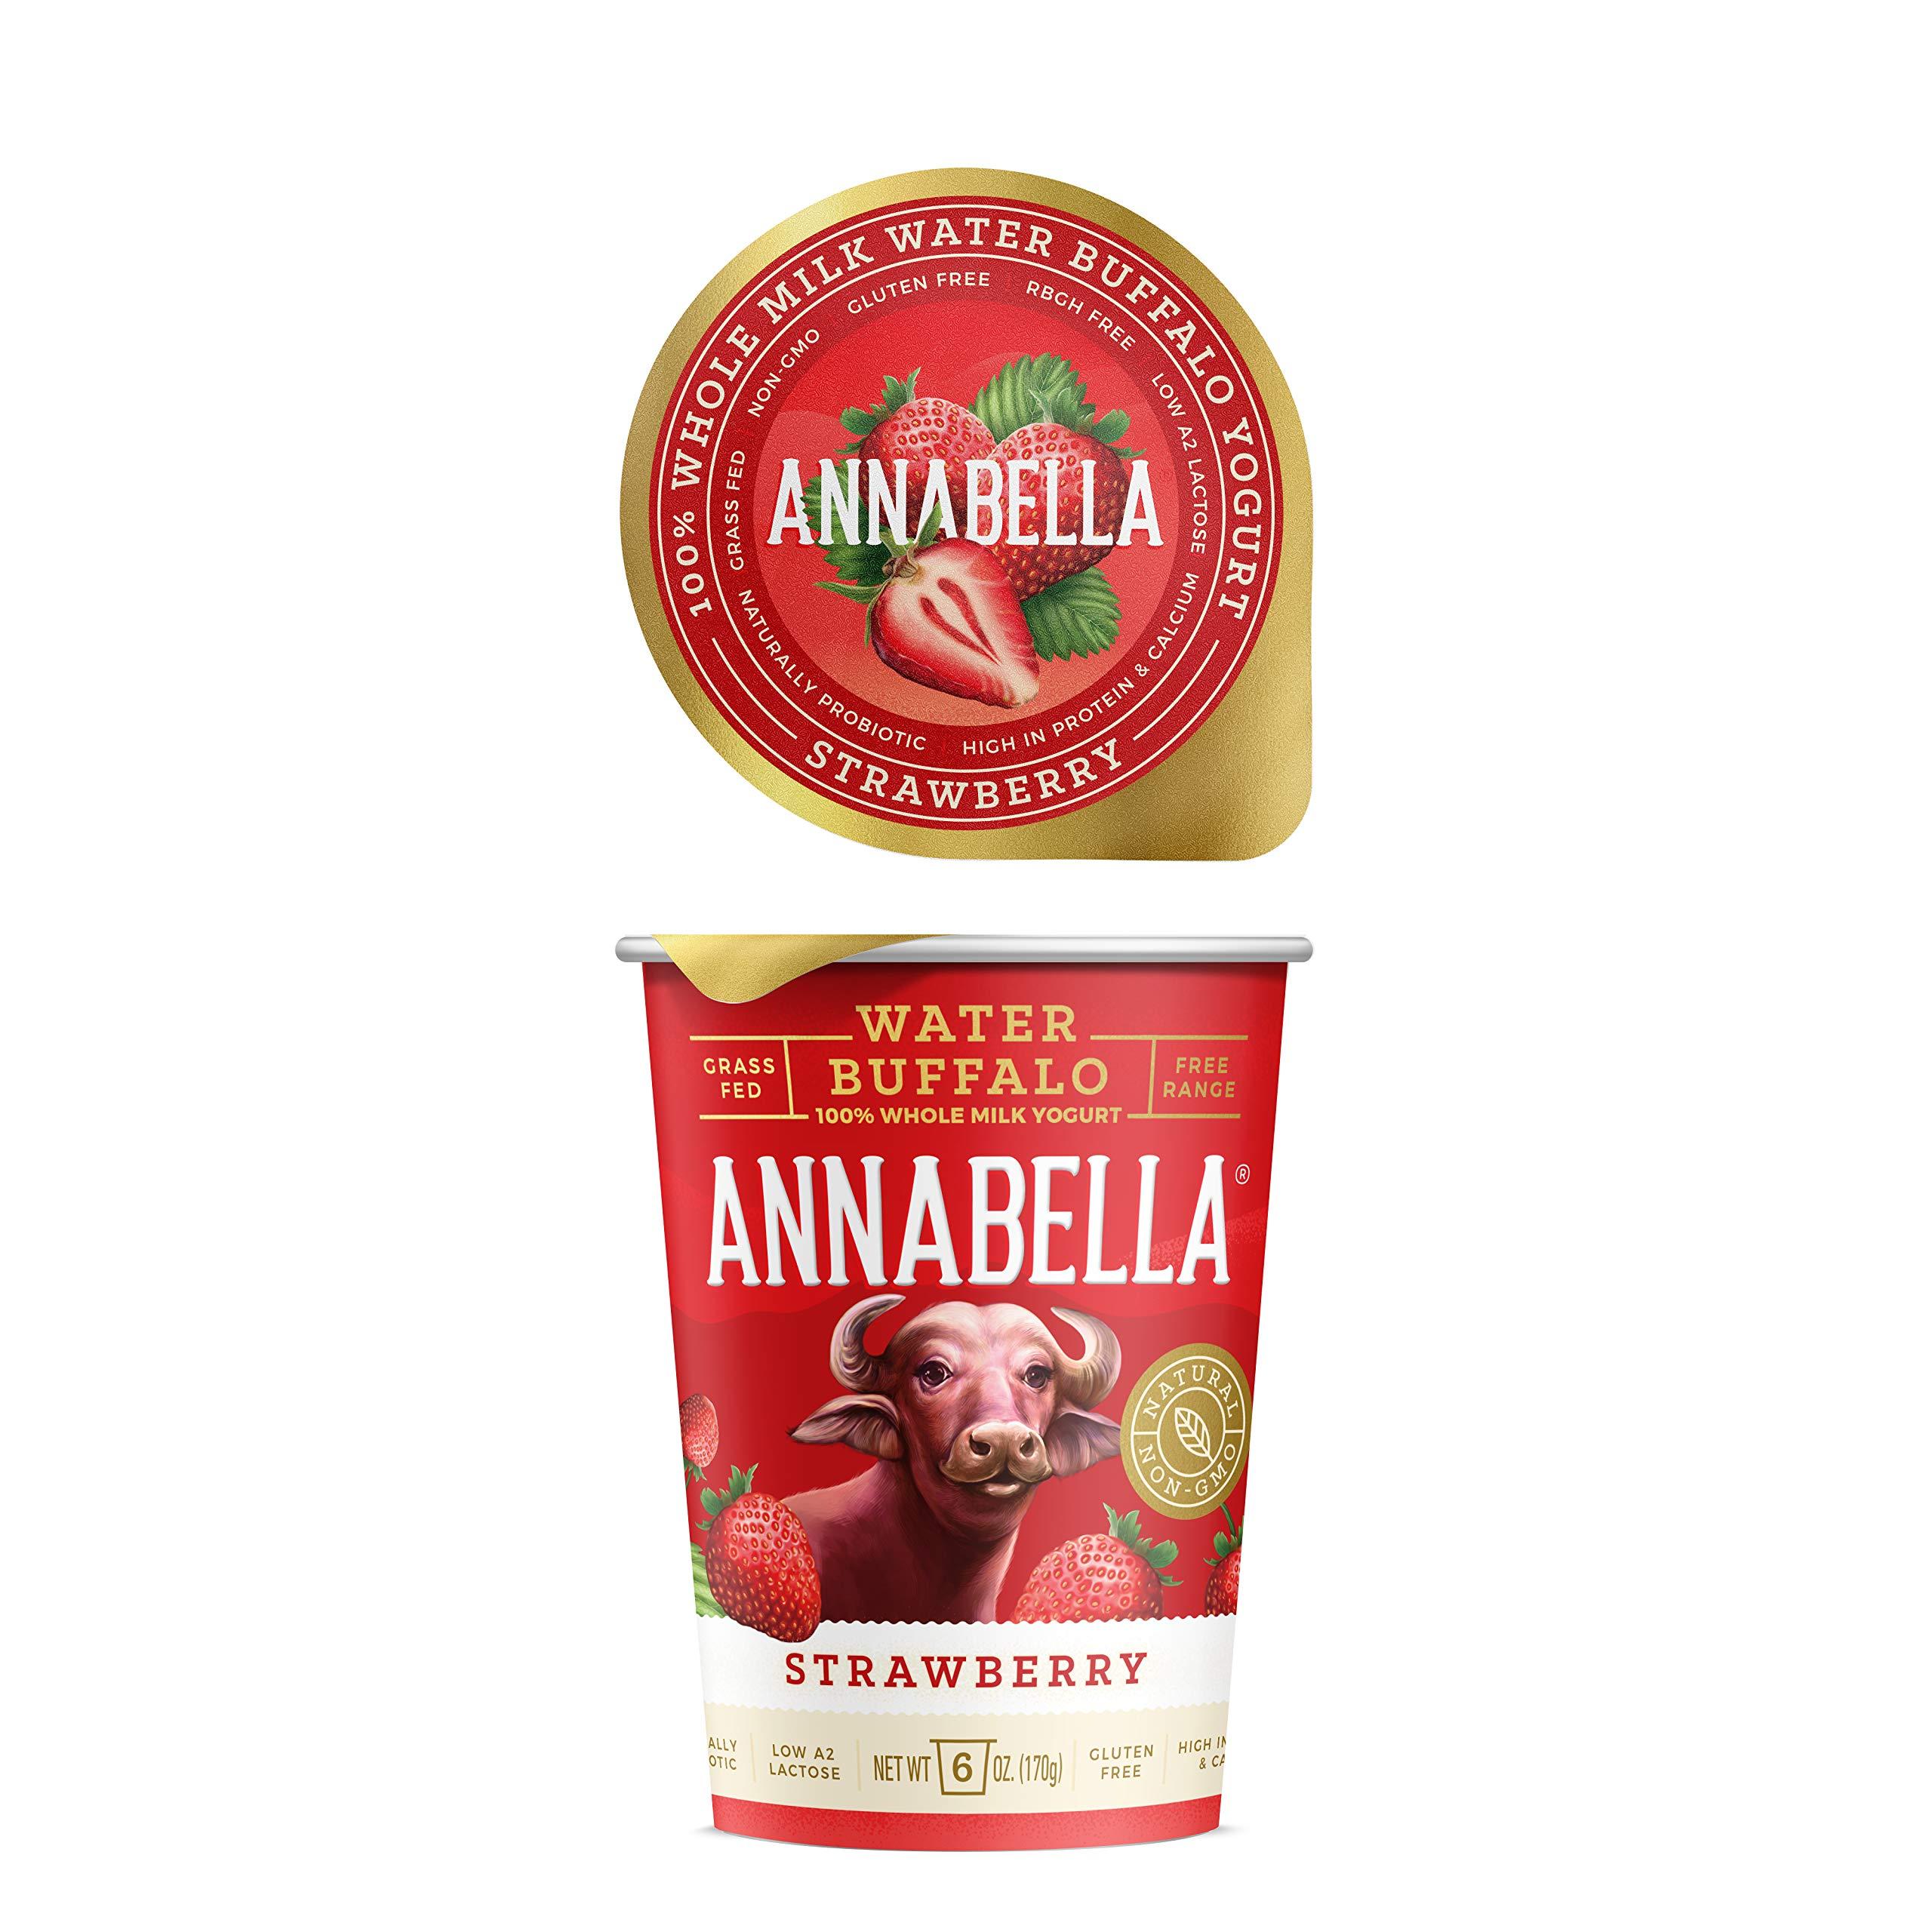 Annabella Water Buffalo Yogurt (Strawberry) - A2/A2 Water Buffalo Milk, Non-GMO, Gluten Free, 100% Grass Fed Higher Protein, More Calcium, Less Cholesterol and Lactose / 6oz Cup-6 Cups per case